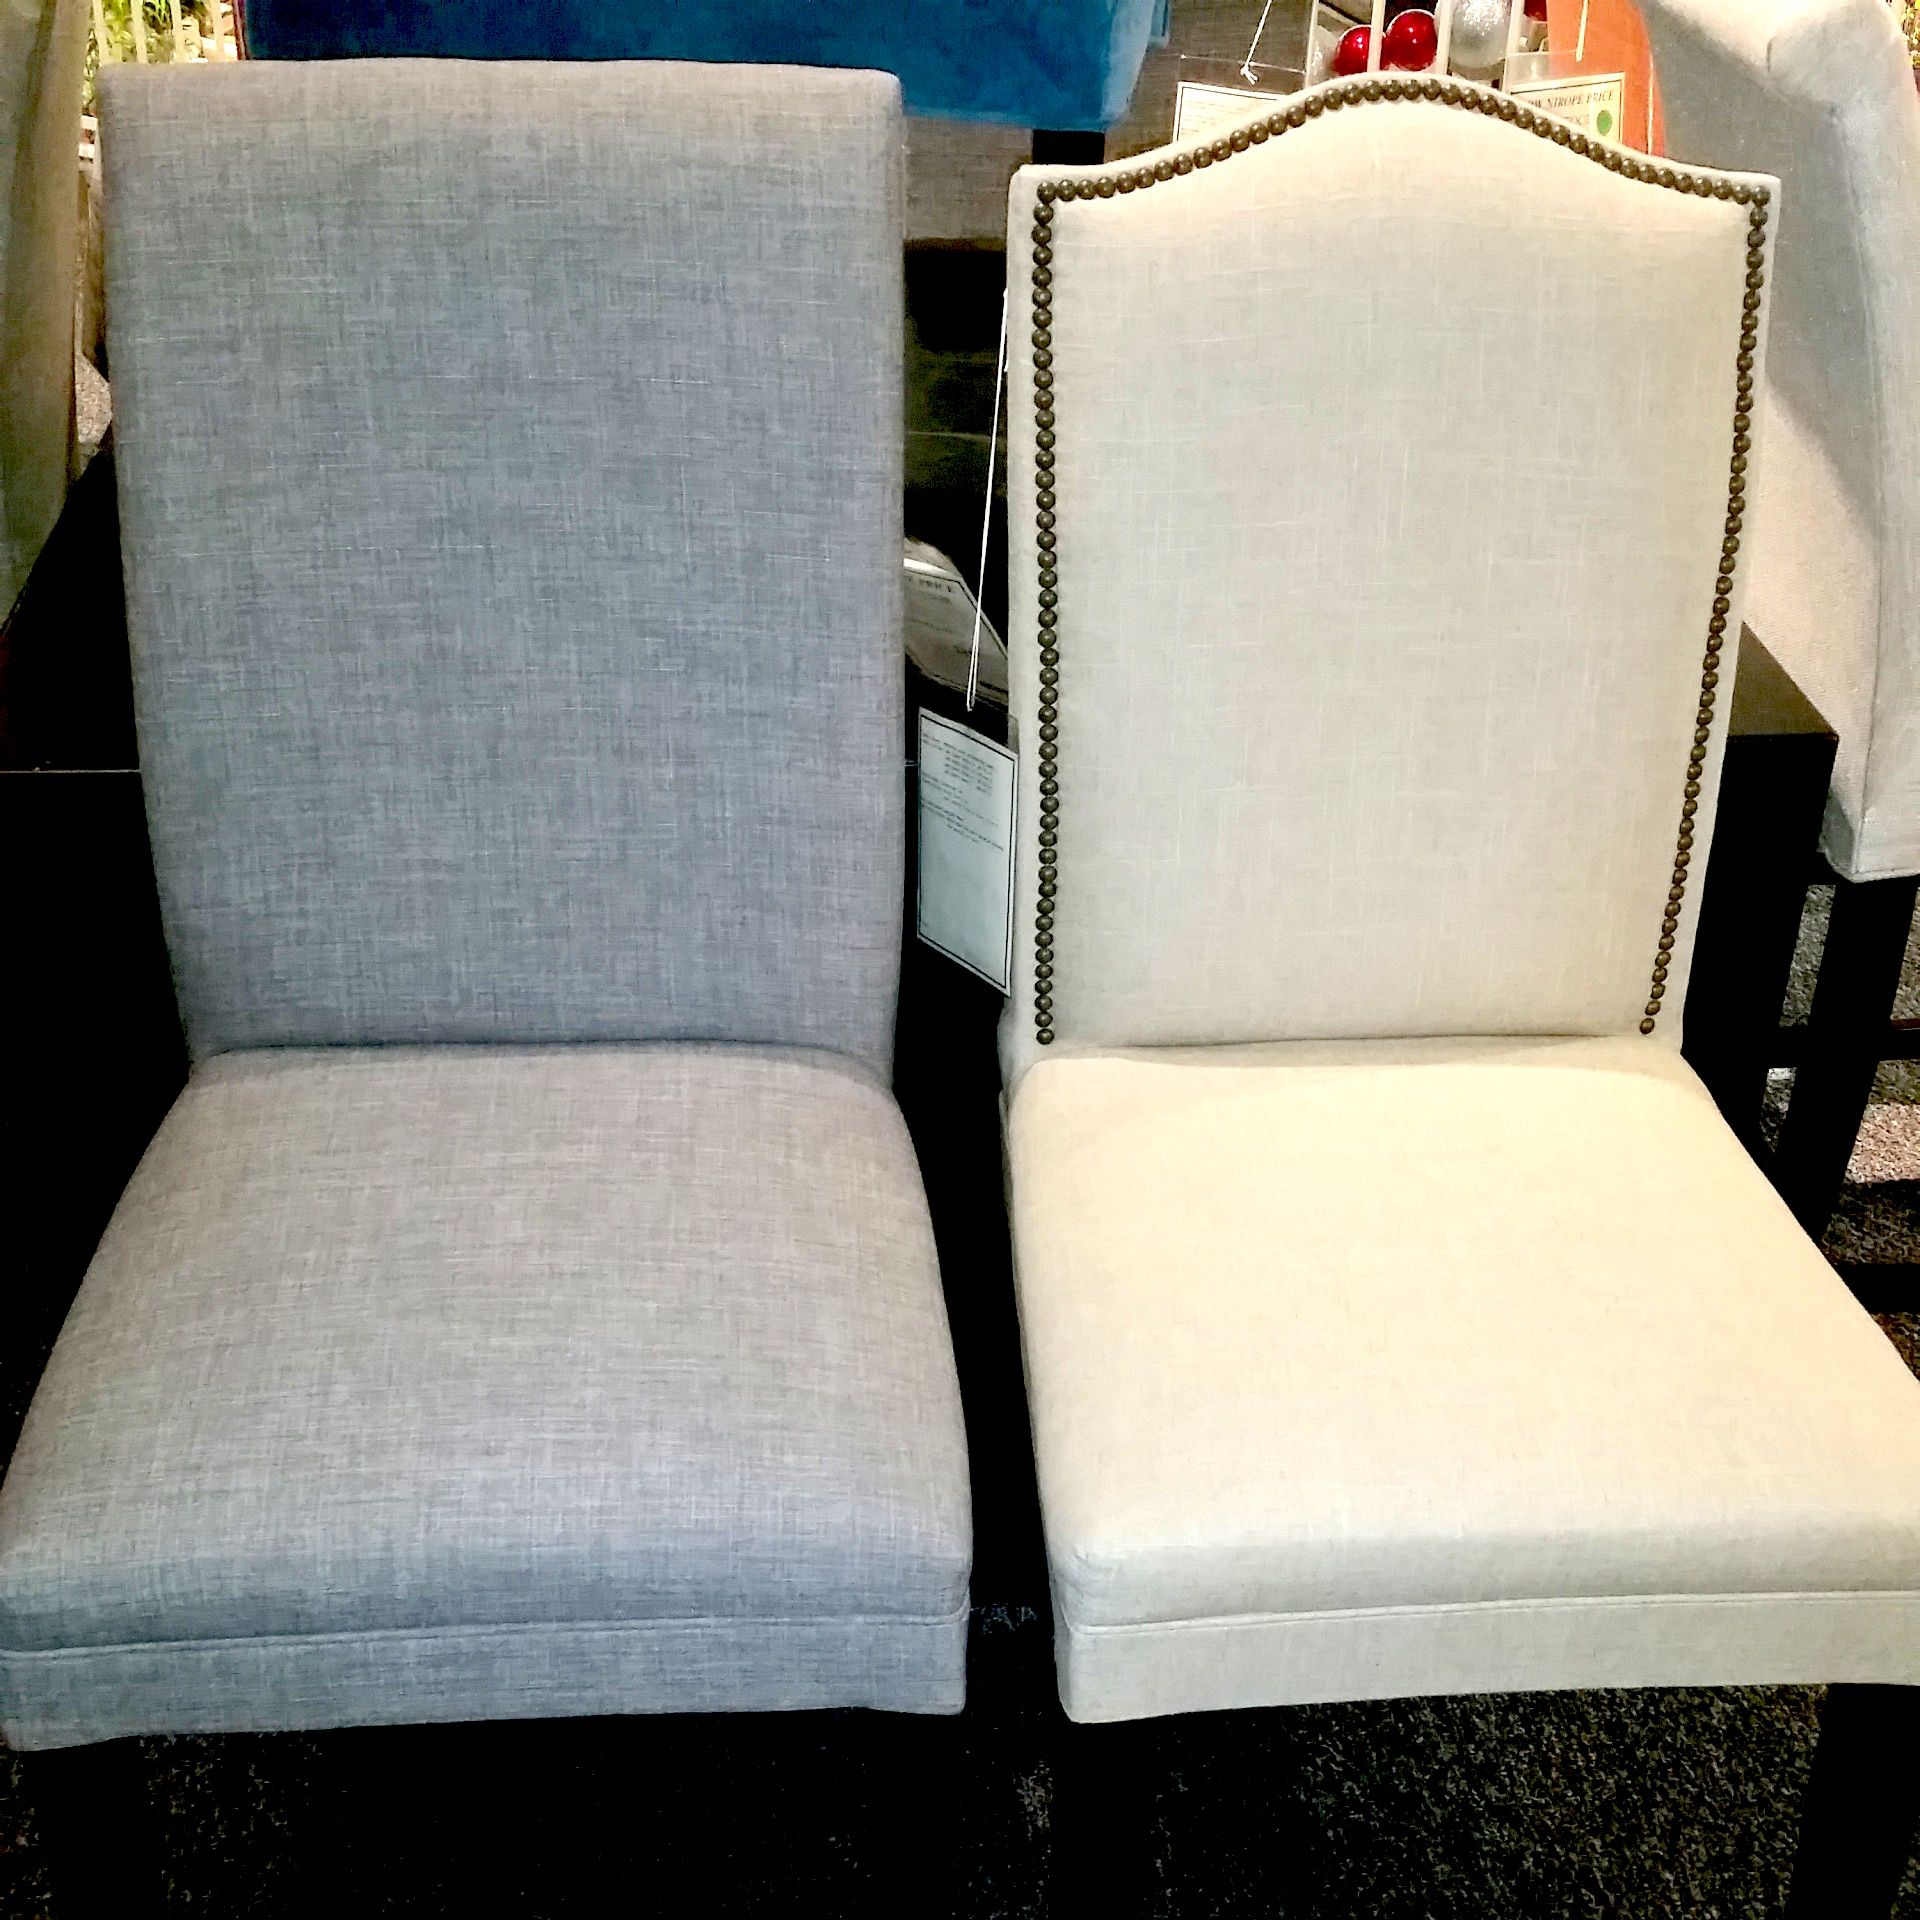 dining chair cardi's furniture cardis cardisfurniture